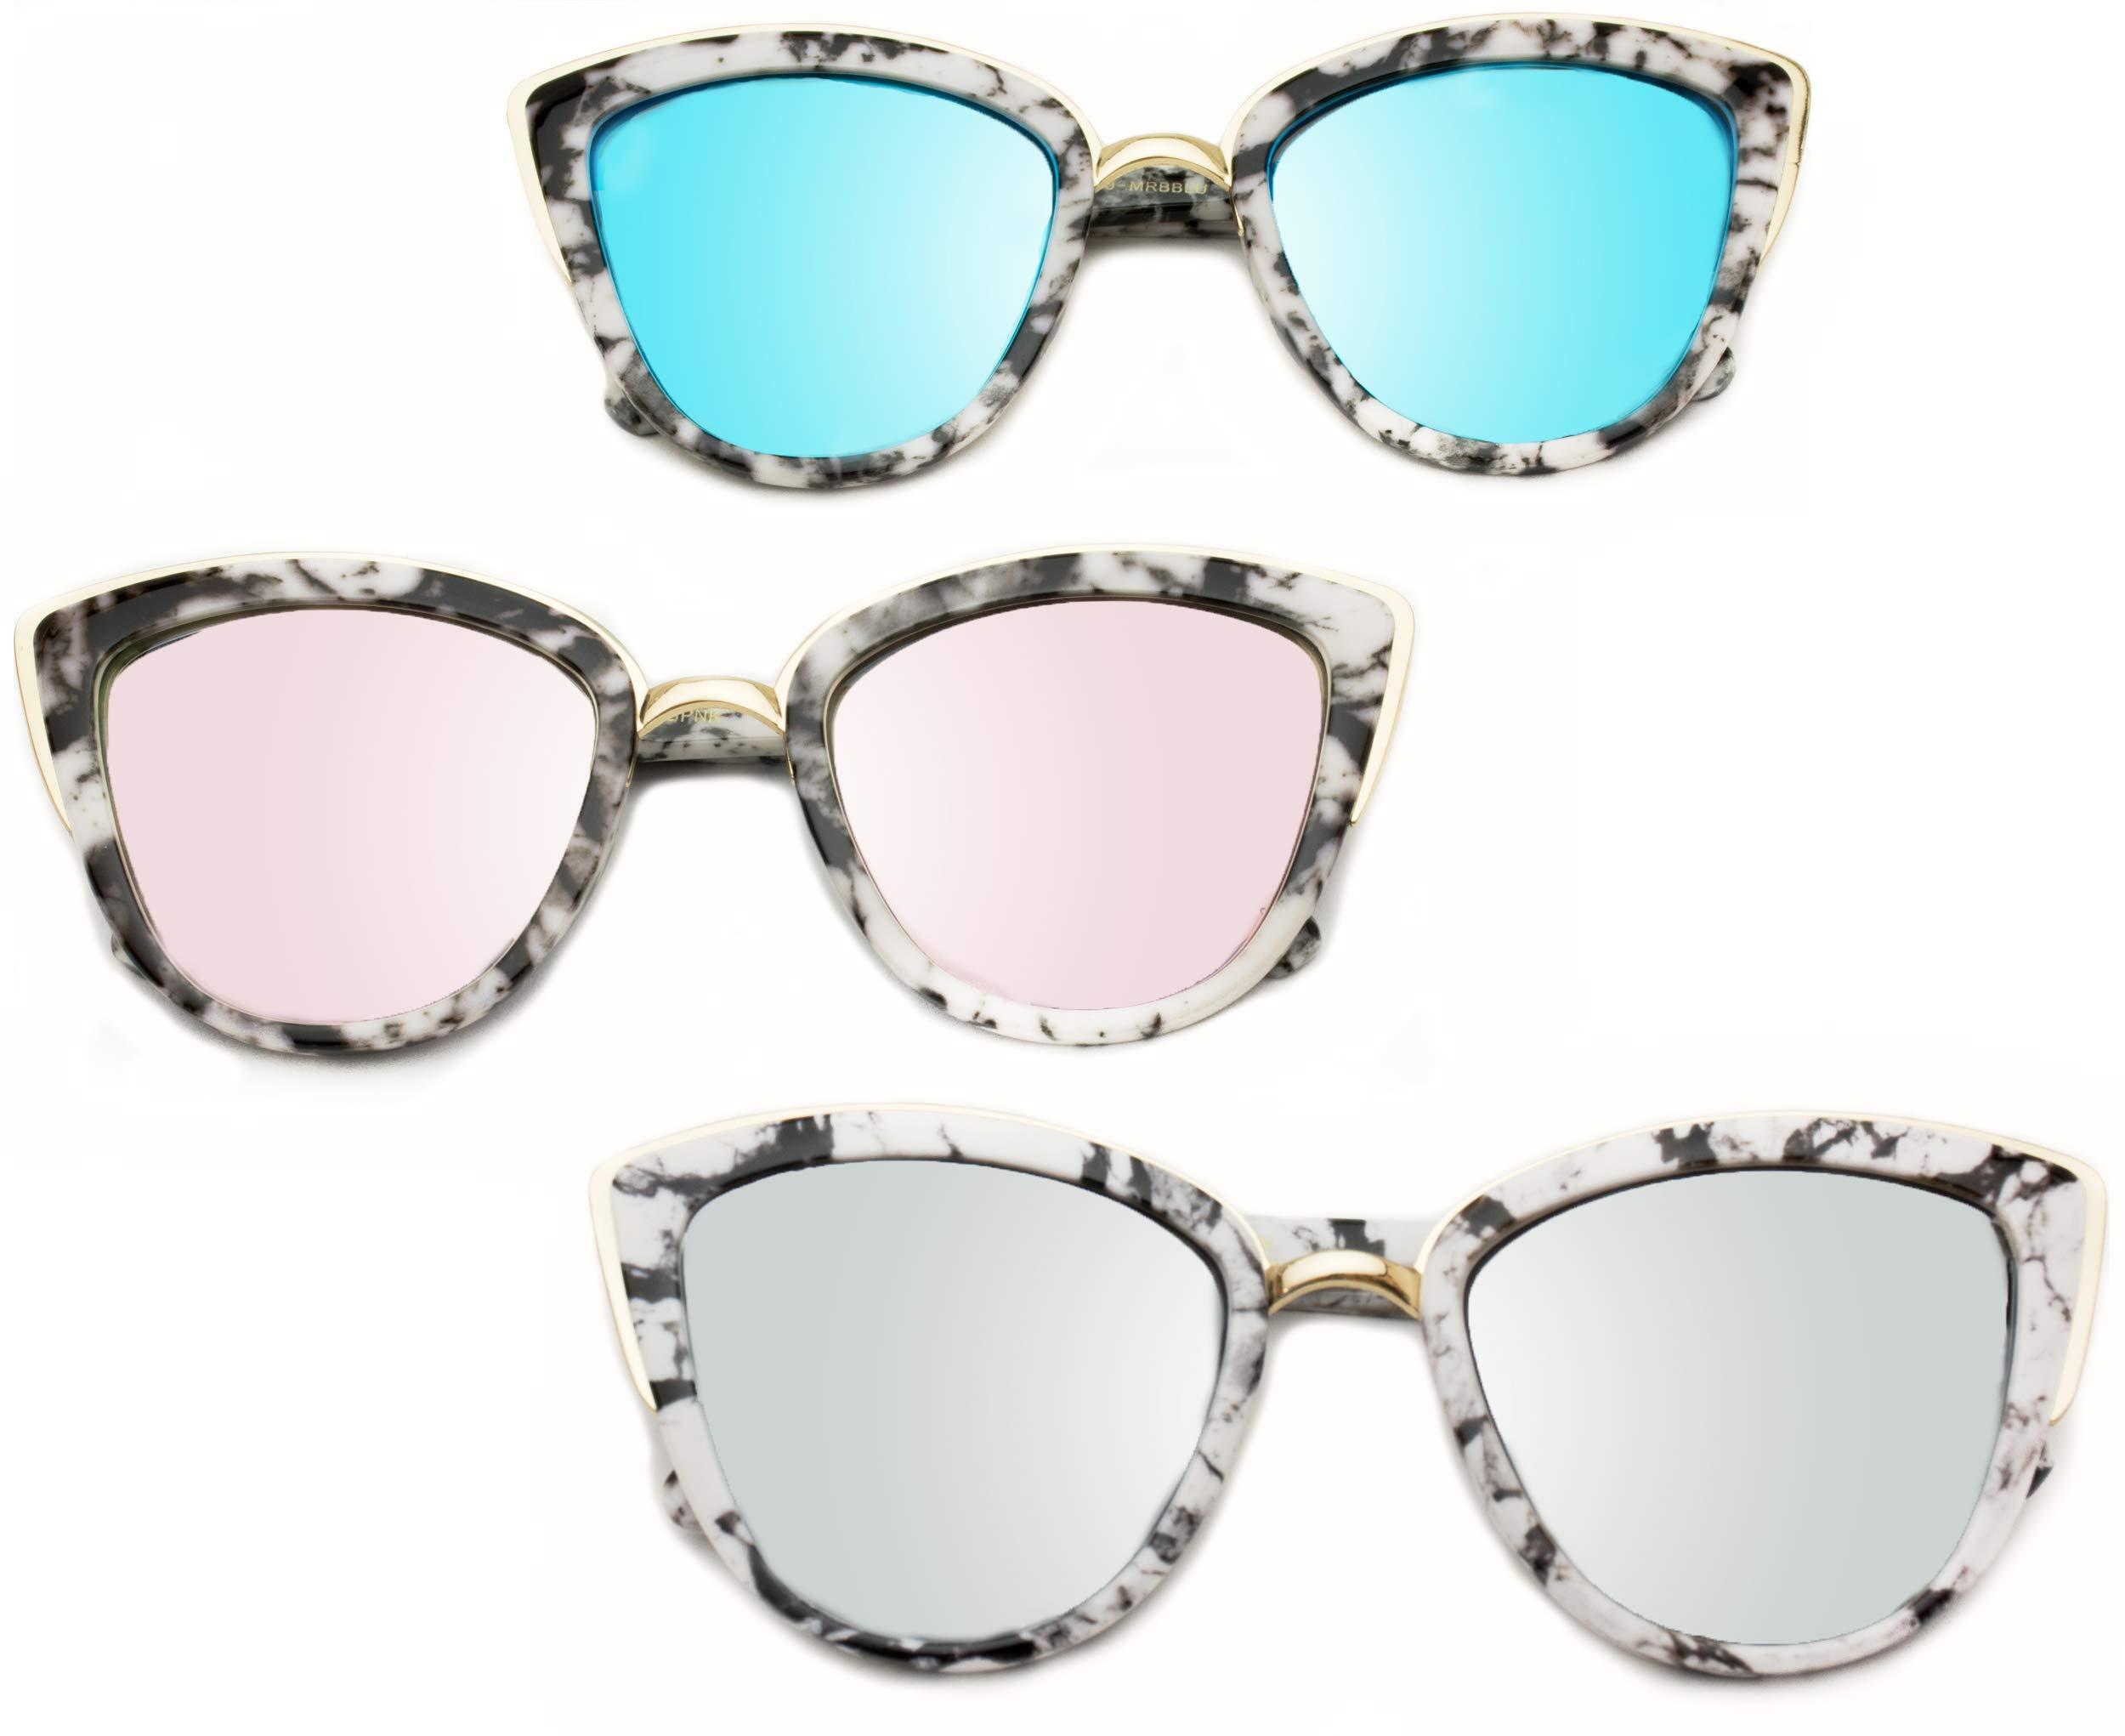 Womens Cat Eye Mirrored Revo Reflective Lenses Oversized Cateyes Sunglasses (Box: Mirror Purple/Mirror Blue/Mirror Silver, 54) by WearMe Pro (Image #3)